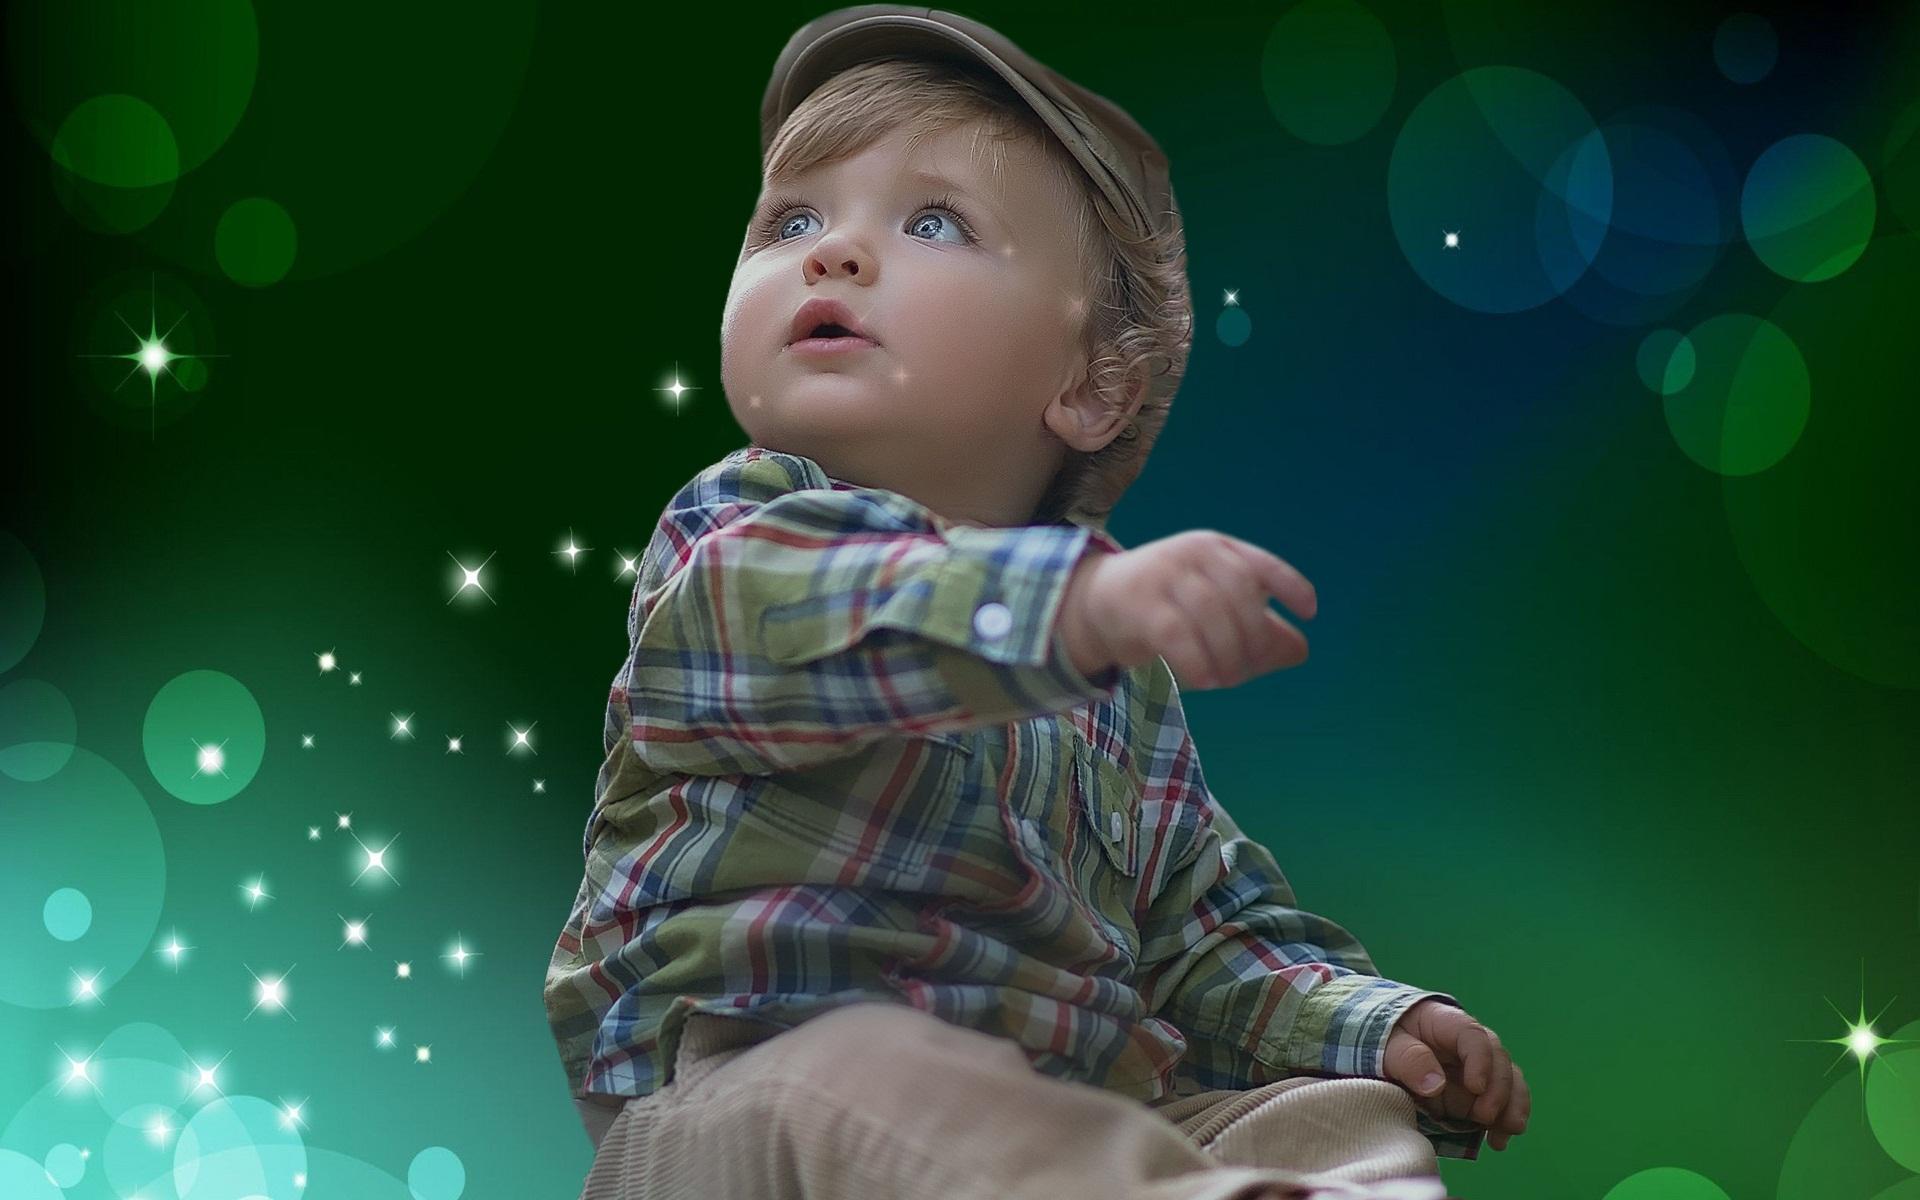 Stylish Cute Baby Boy Images Hd 1920x1200 Download Hd Wallpaper Wallpapertip